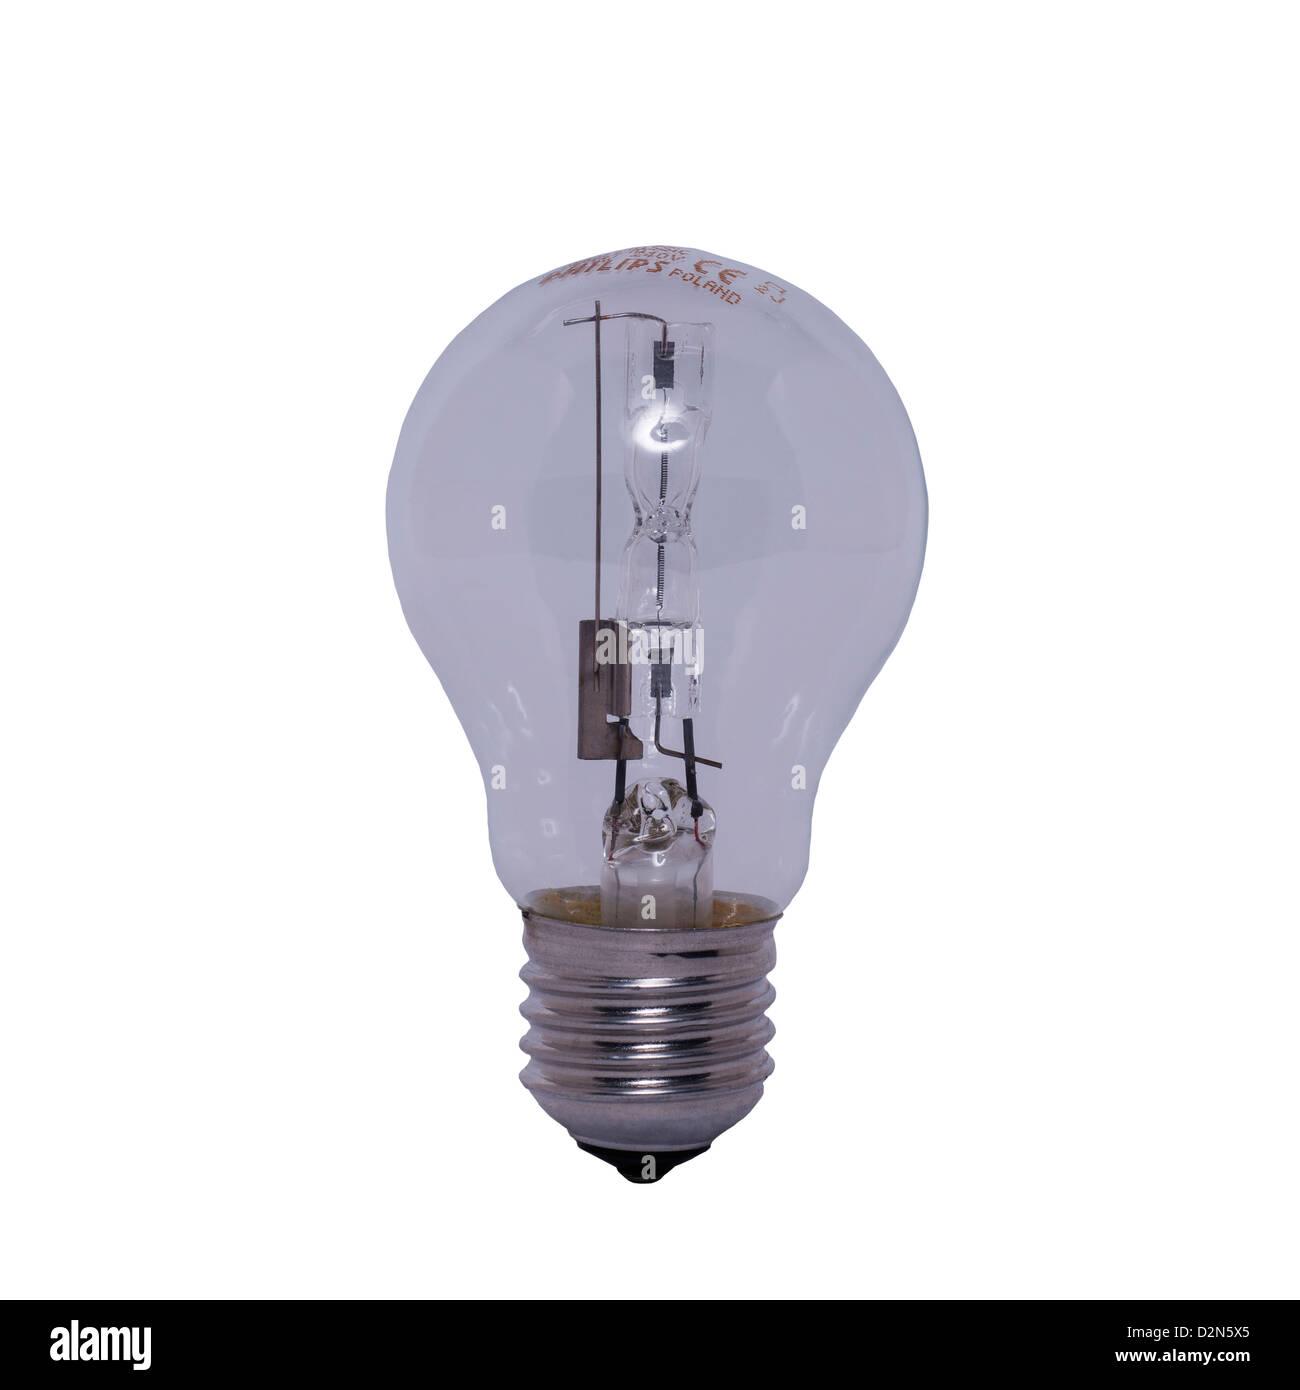 A Philips EcoClassic 70 watt halogen lightbulb on a white background - Stock Image